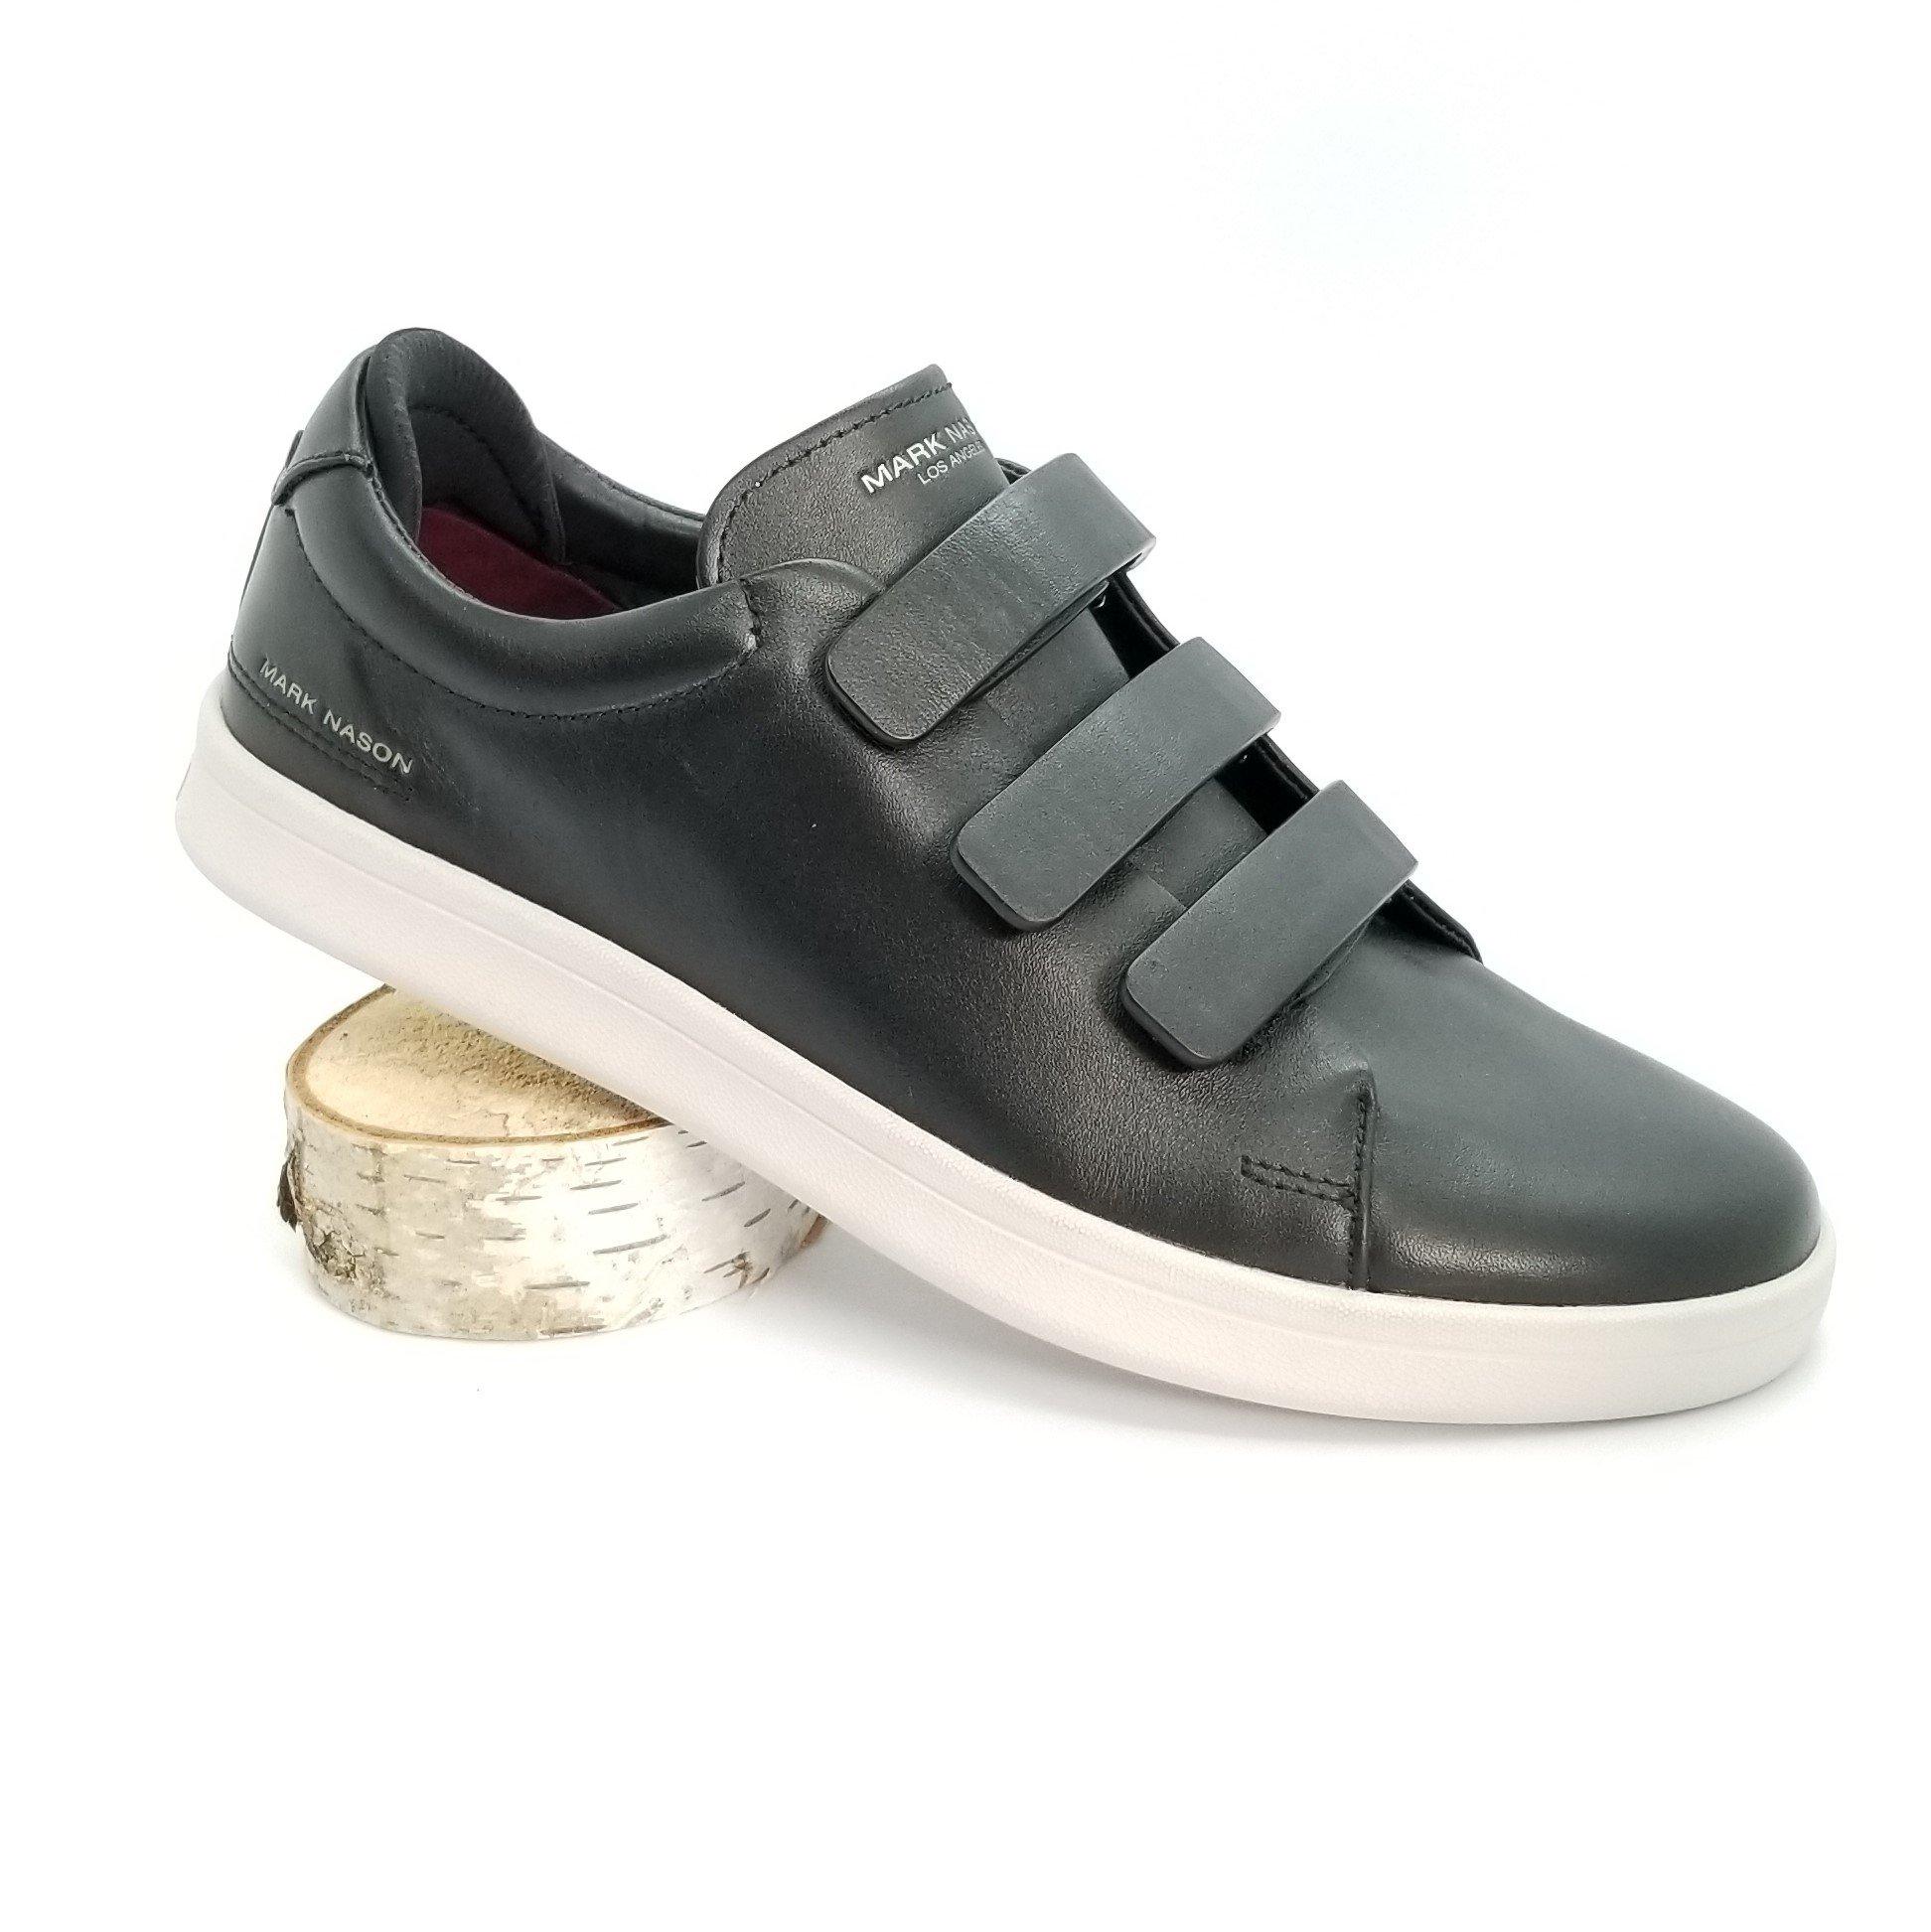 Chaussures Hommeamp; Chaussures Chaussures Femme Rioux Hommeamp; Hommeamp; Rioux Chaussures Femme Rioux Femme 0XkN8nwPZO